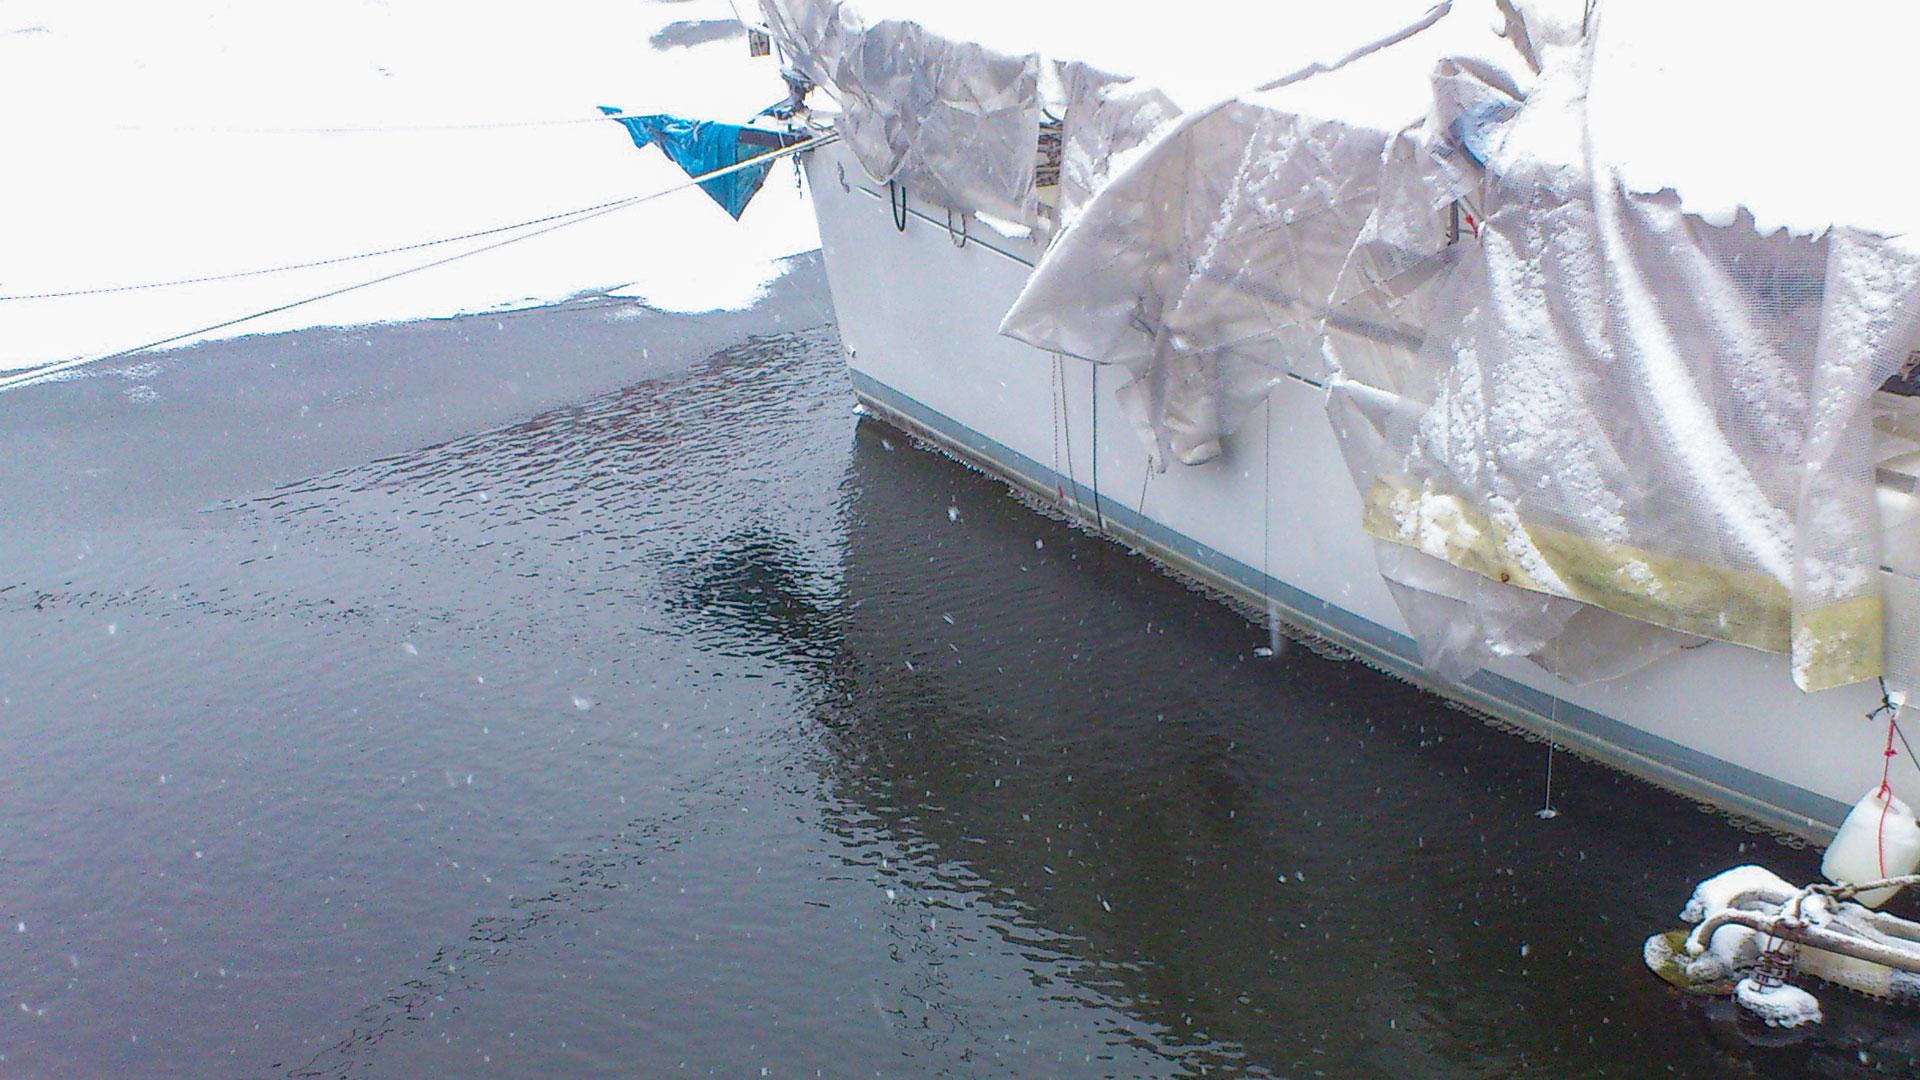 båt-de-icer